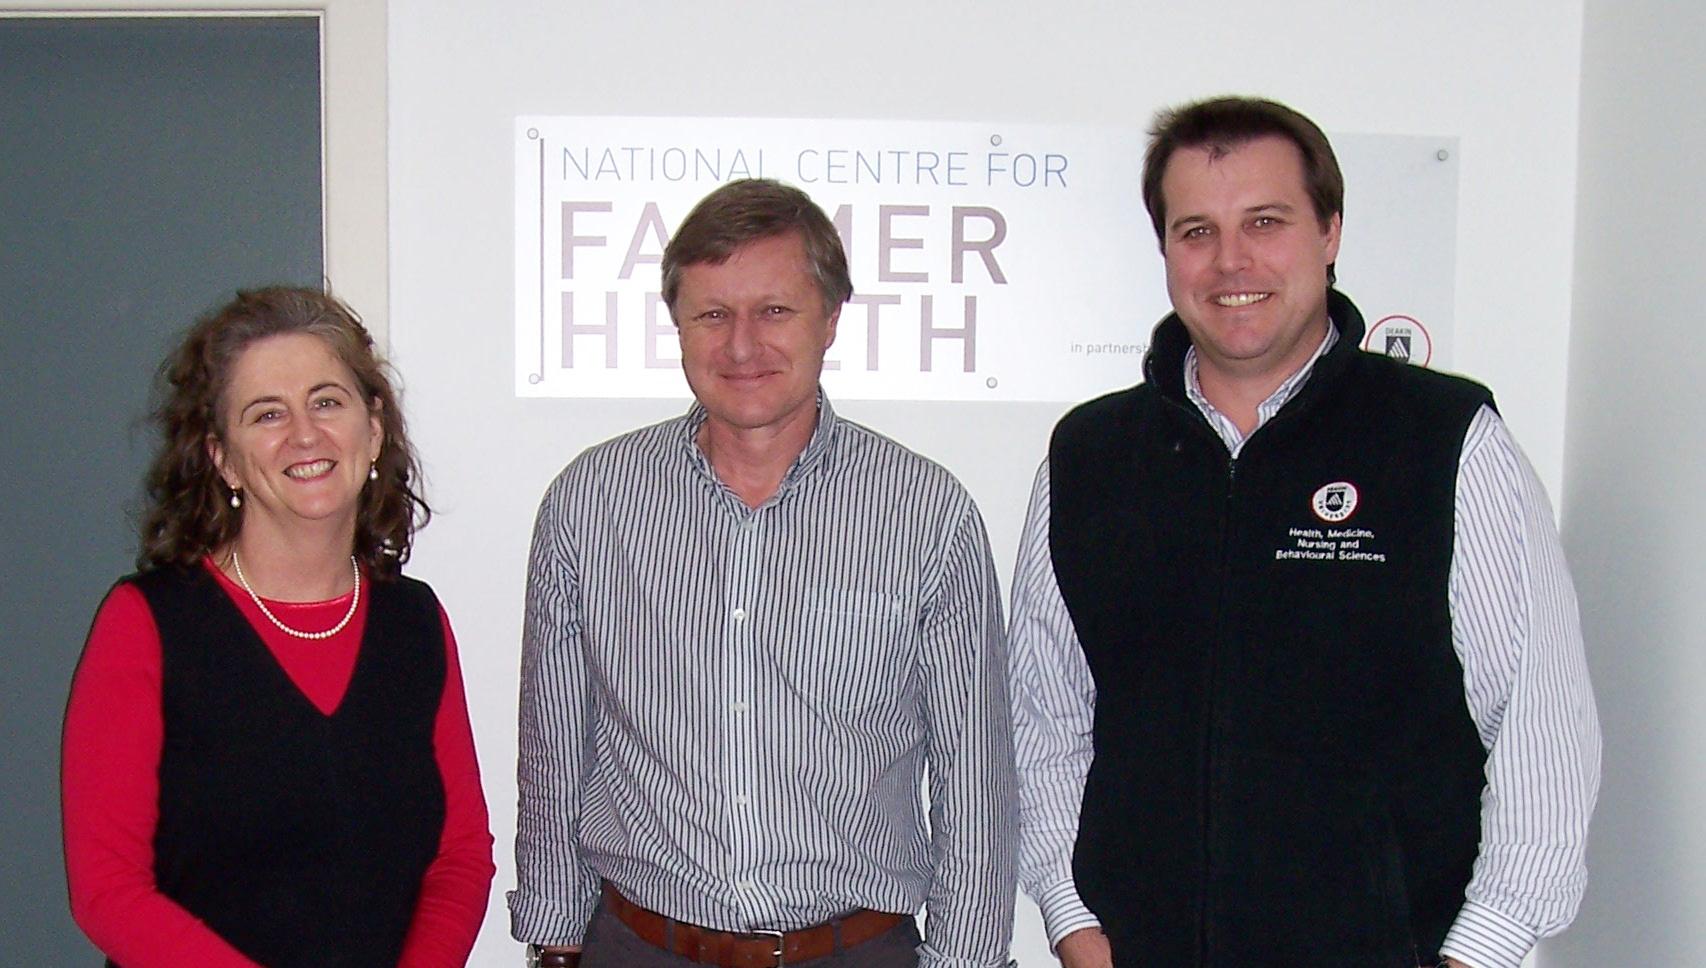 Mark Wagstaffe from Massey University, NZ visitng NCFH